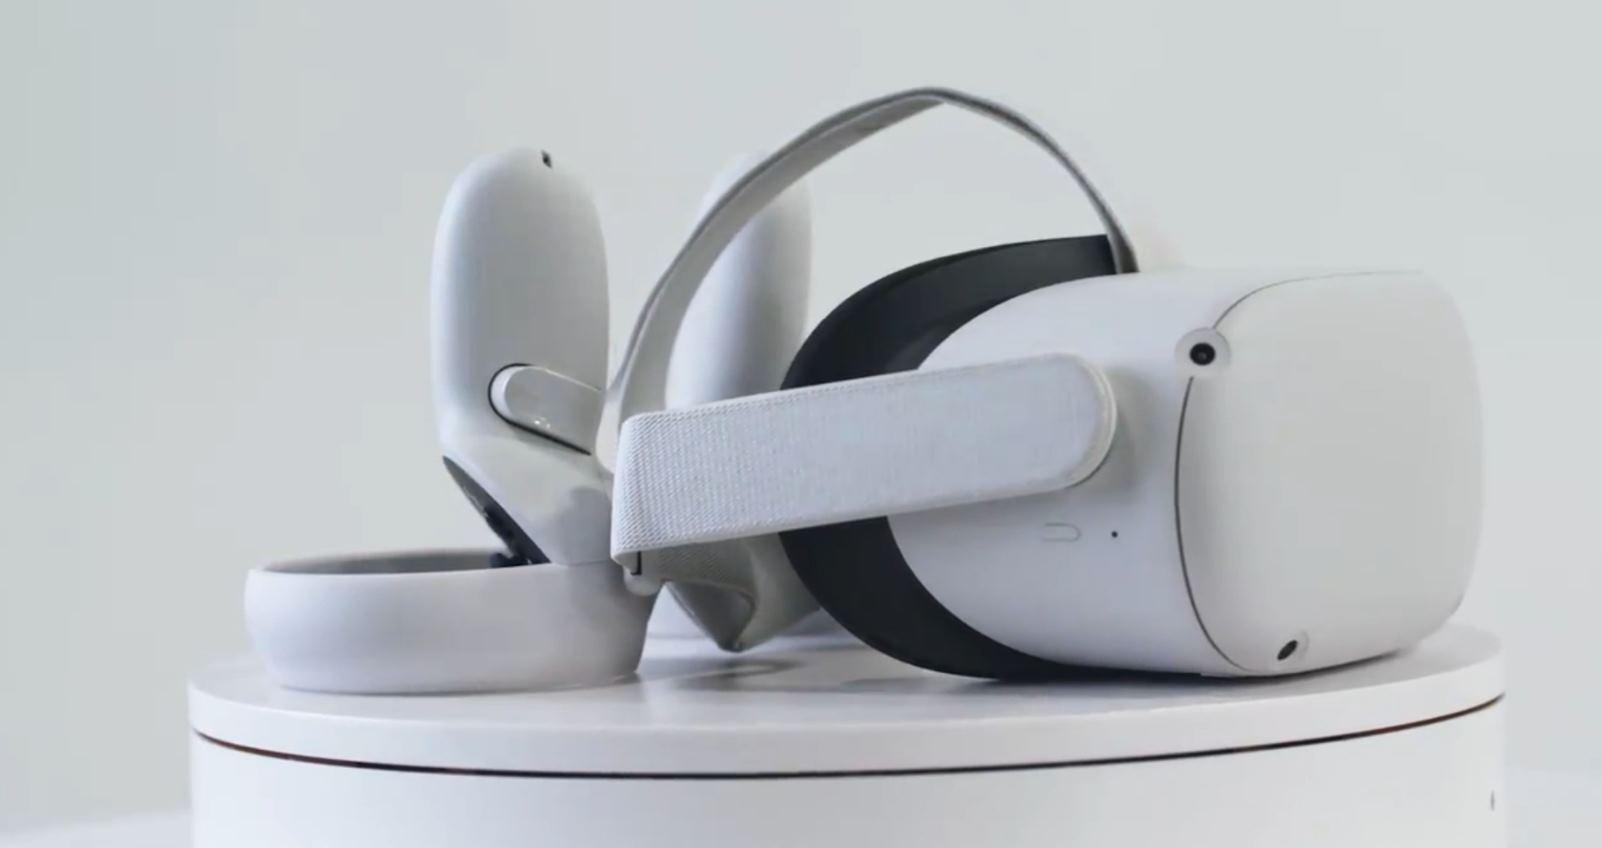 oculus guest